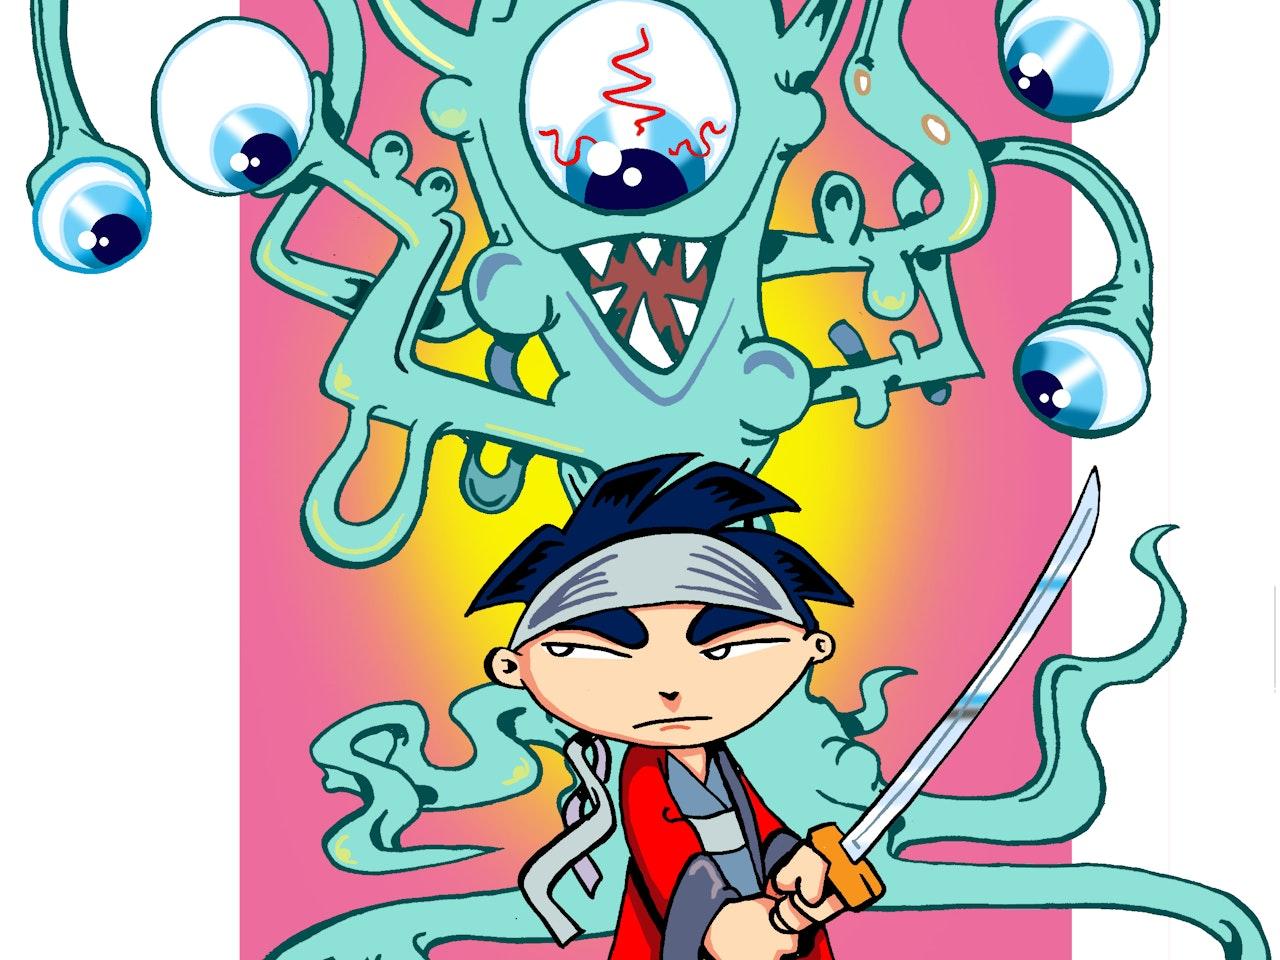 samurai sword japan Cool friendly funny Funky Happy manga anime childrens cartoon comic strip Book cover illustration animation  urban vinyl toy  harajuku    friendly monsters aliens